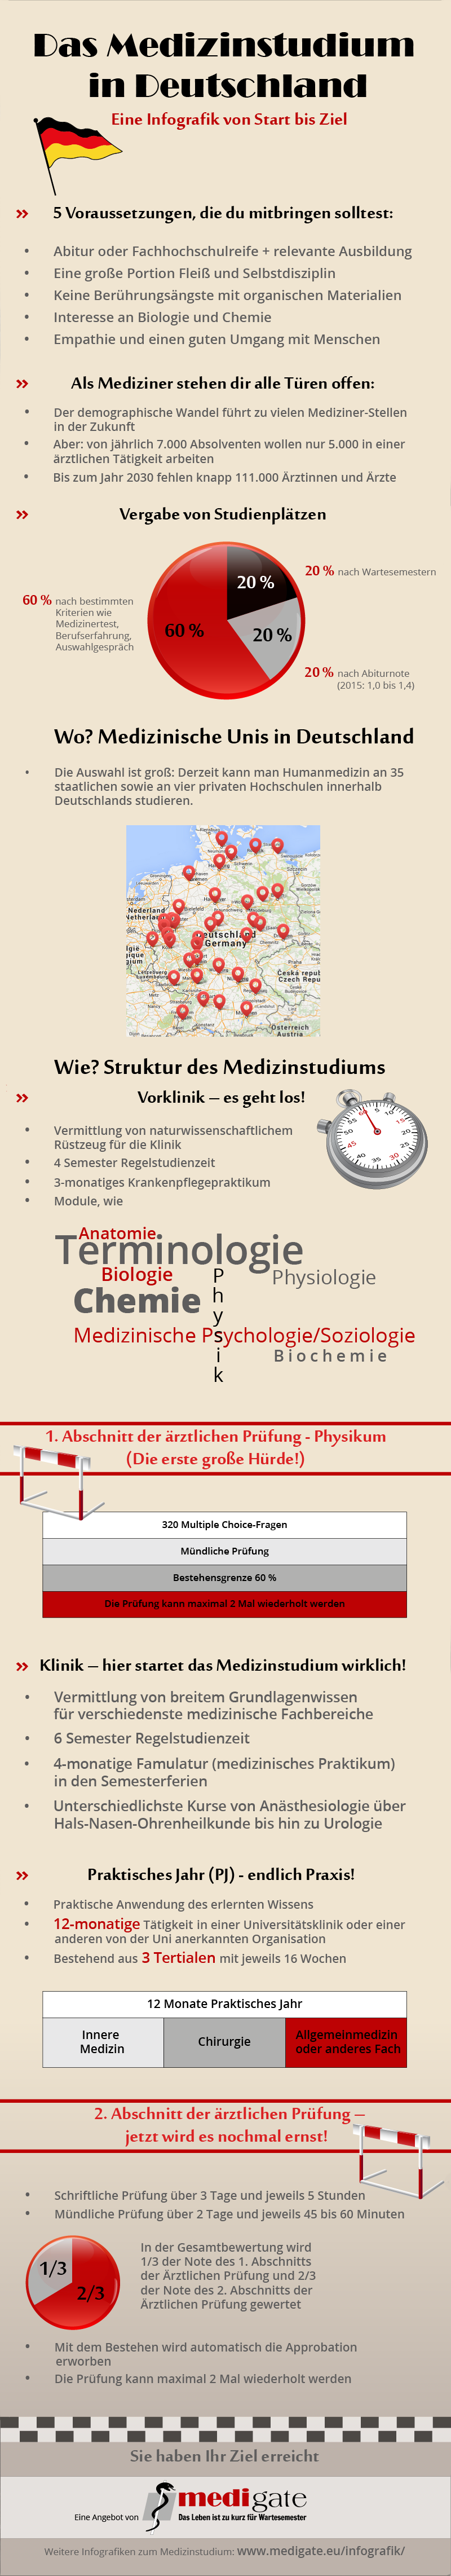 Infografik Medizinstudium in Deutschland | medicine | Pinterest ...